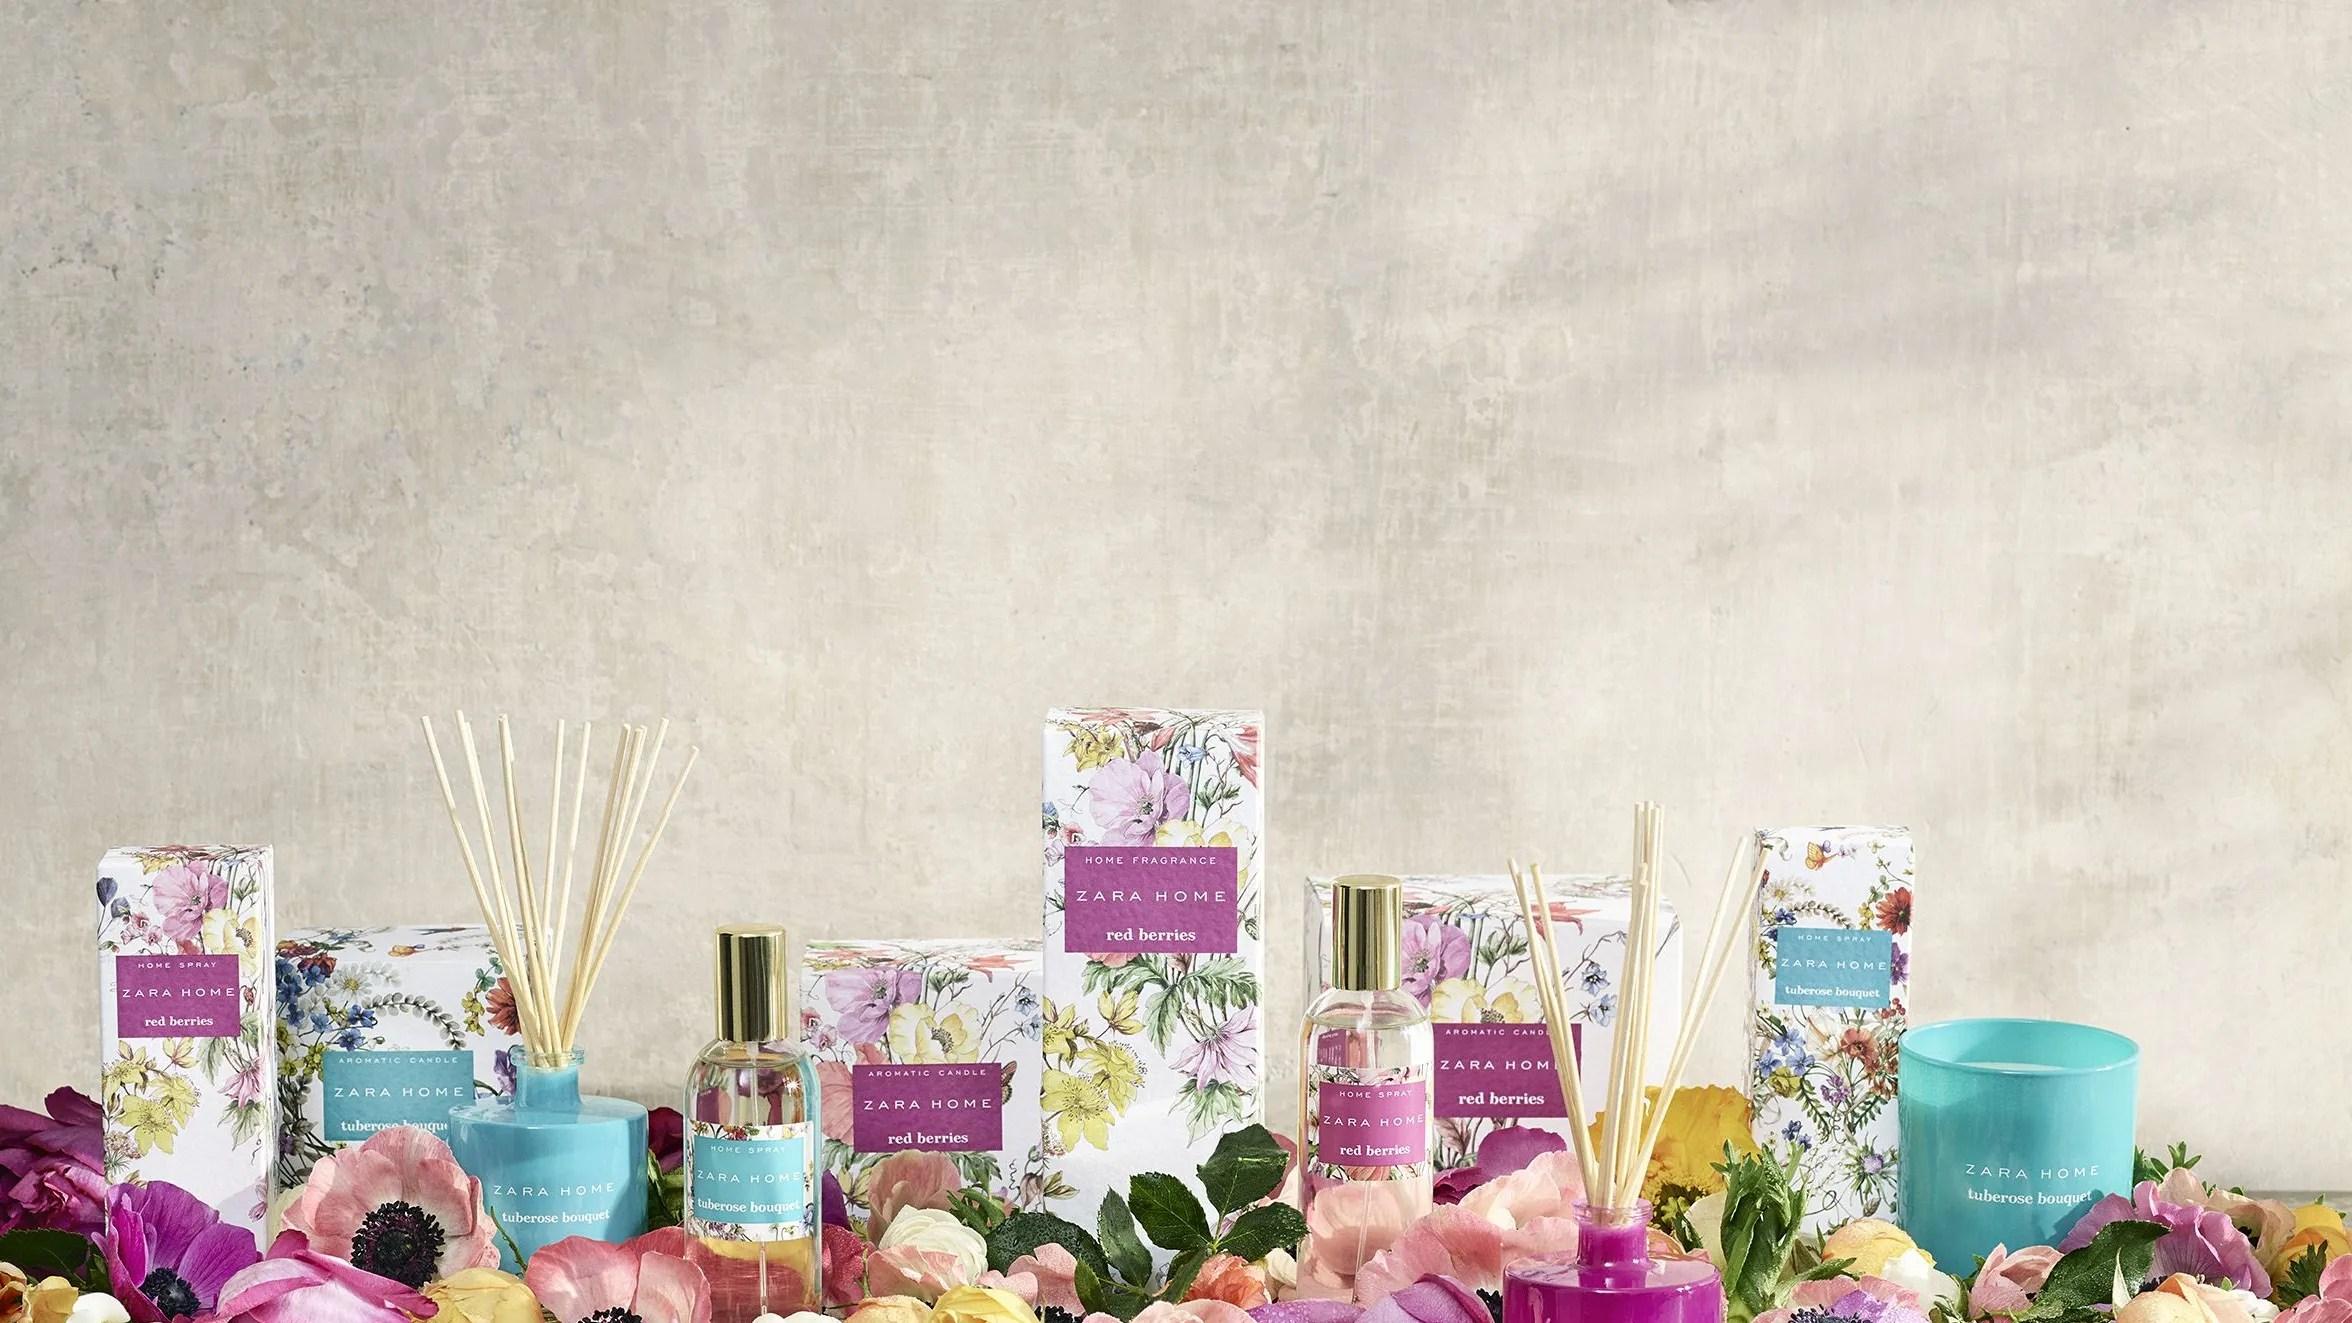 ZARA HOME限量六款香氛完整上市。讓春天清新浪漫香氣圍繞一整天|香氛美體-VOGUE時尚網 | Vogue Taiwan